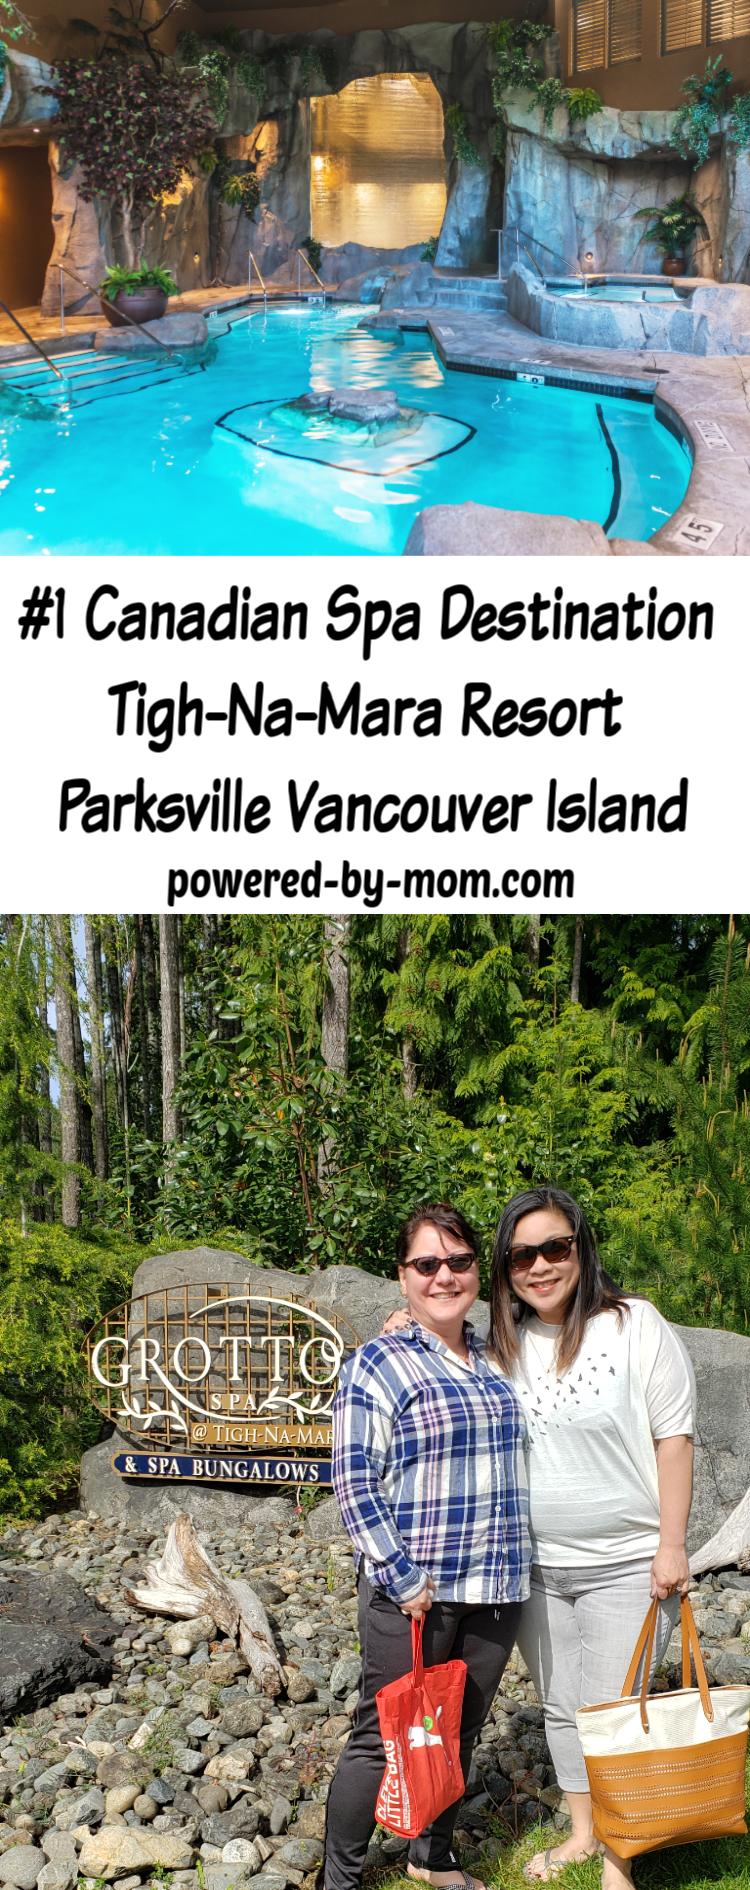 Vancouver Island Spa - Tigh-Na-Mara Parksville